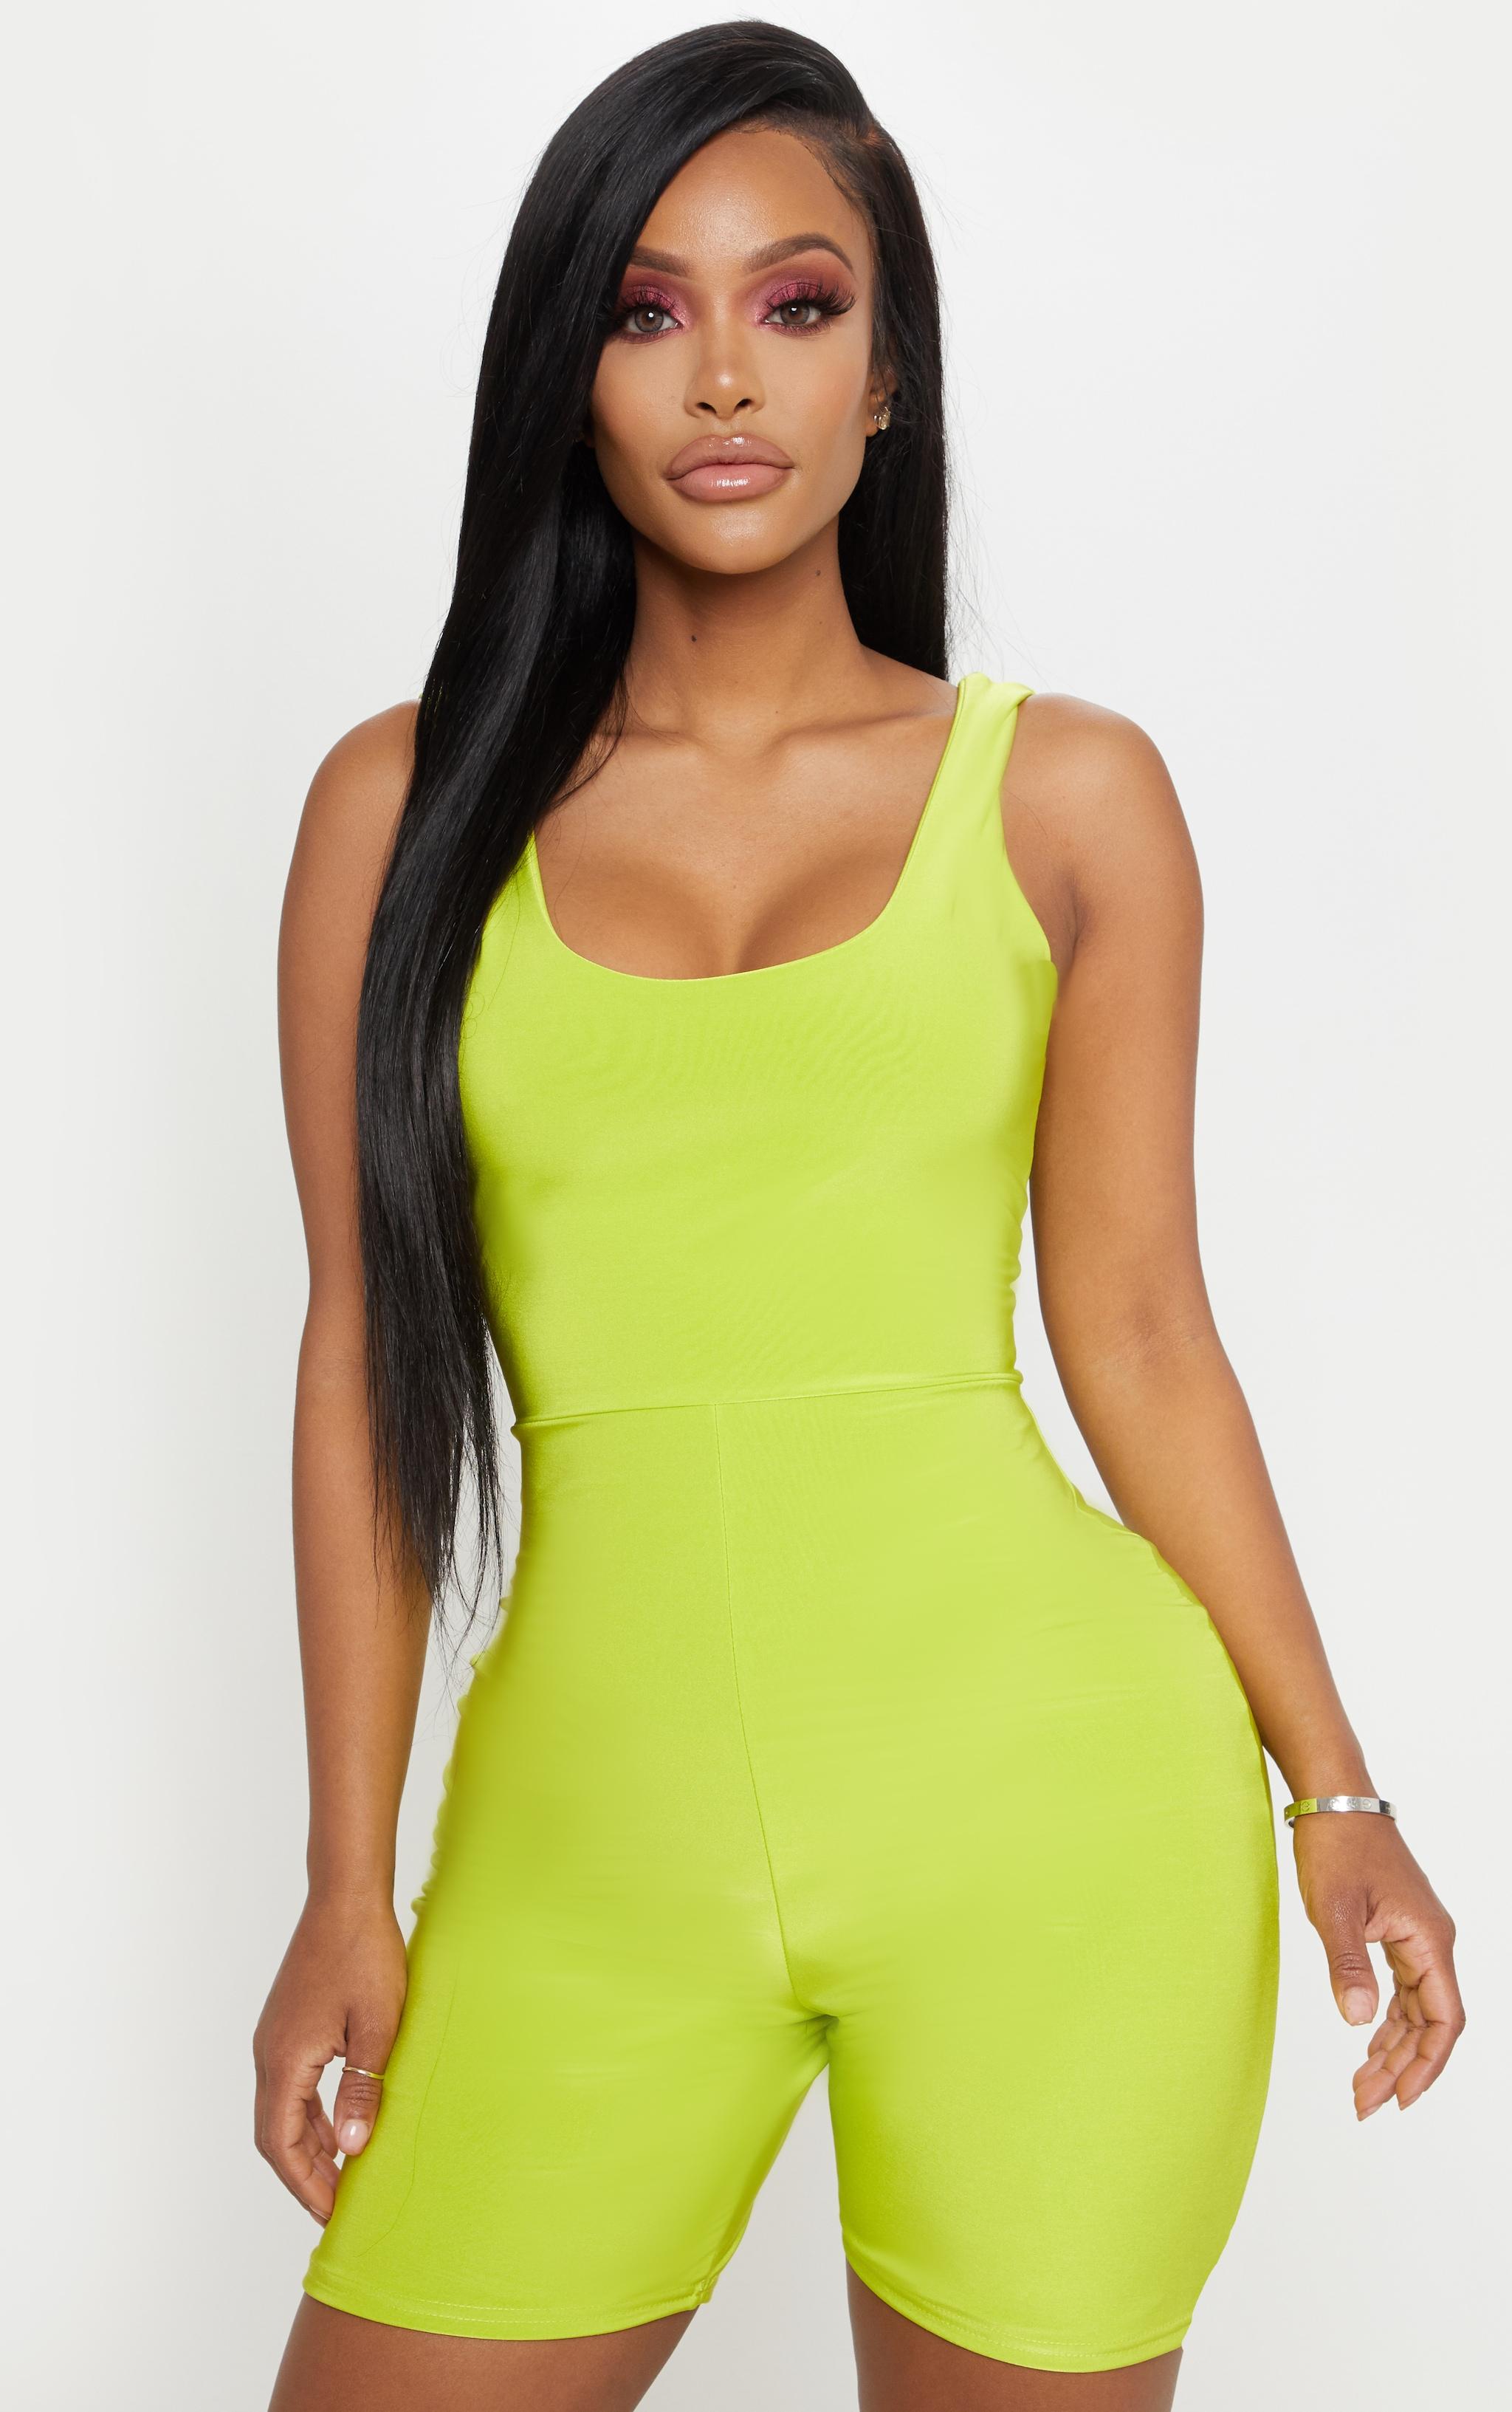 Shape Neon Lime Slinky Scoop Neck Unitard 4